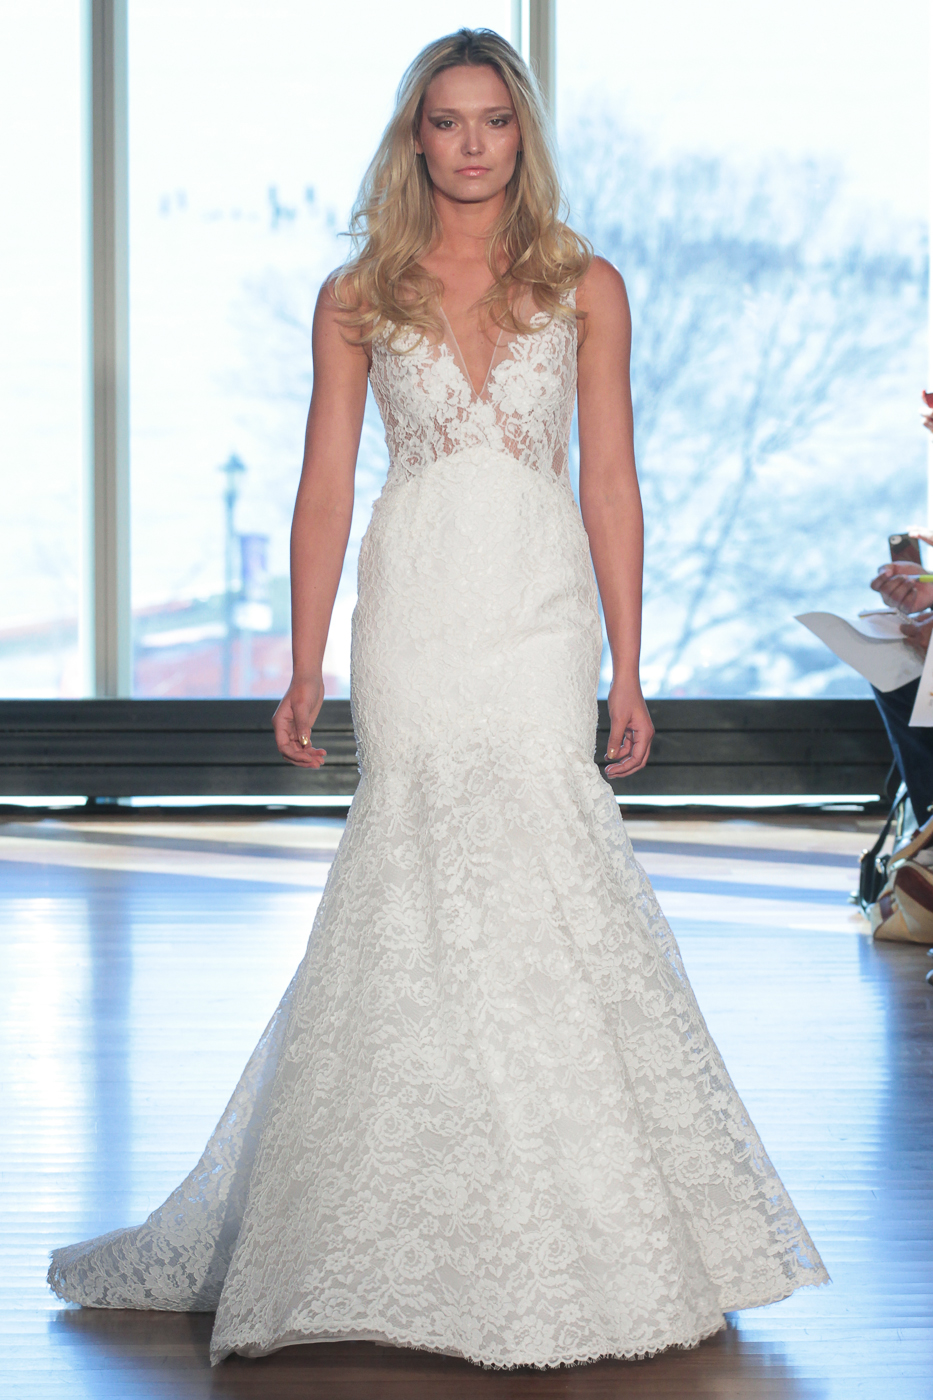 Luxury Wedding Dresses New York : Fashion examiner luxury wedding dresses from new york